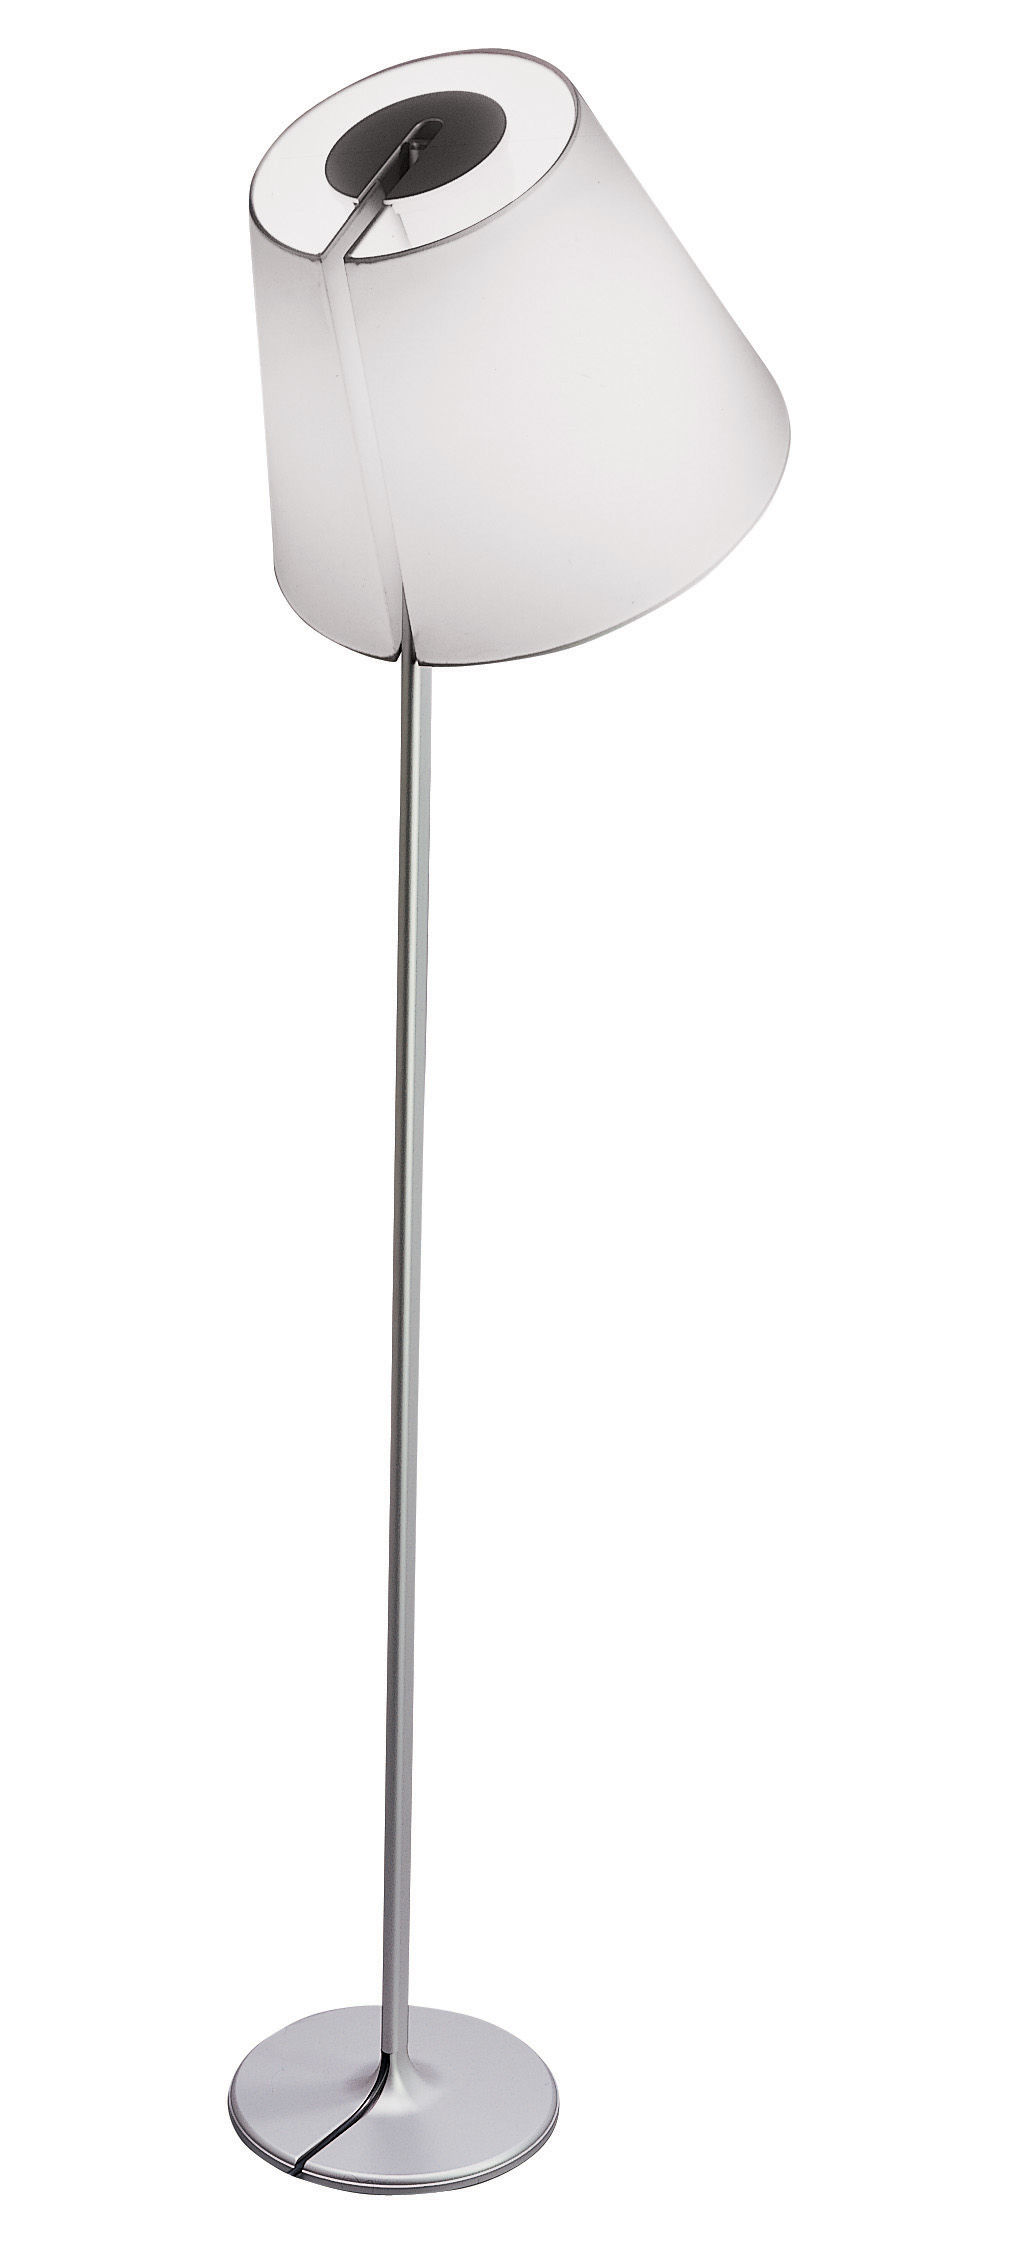 Leuchten - Stehleuchten - Melampo Terra Stehleuchte - Artemide - Aluminium-grau - Aluminium, Gewebe